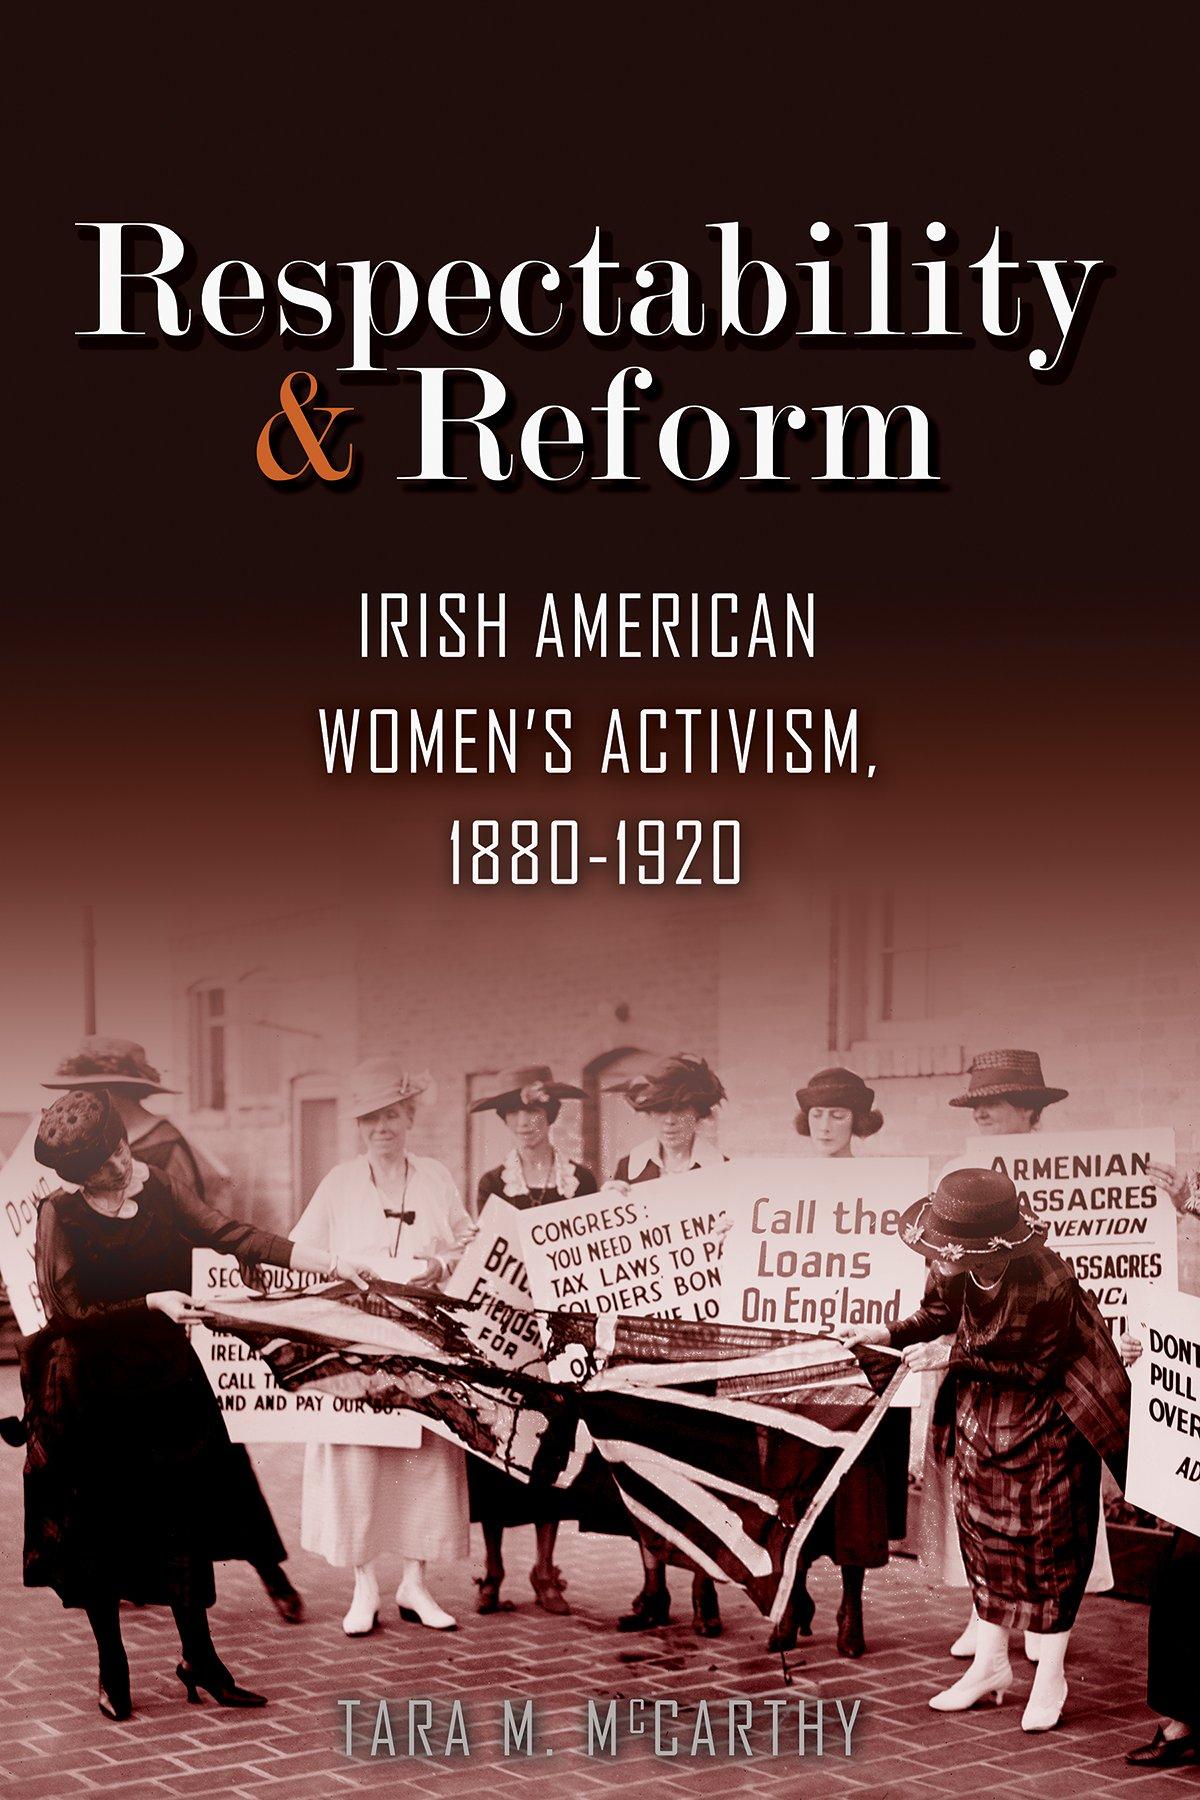 Respectability and Reform: Irish American Women's Activism, 1880-1920 (Irish Studies) pdf epub